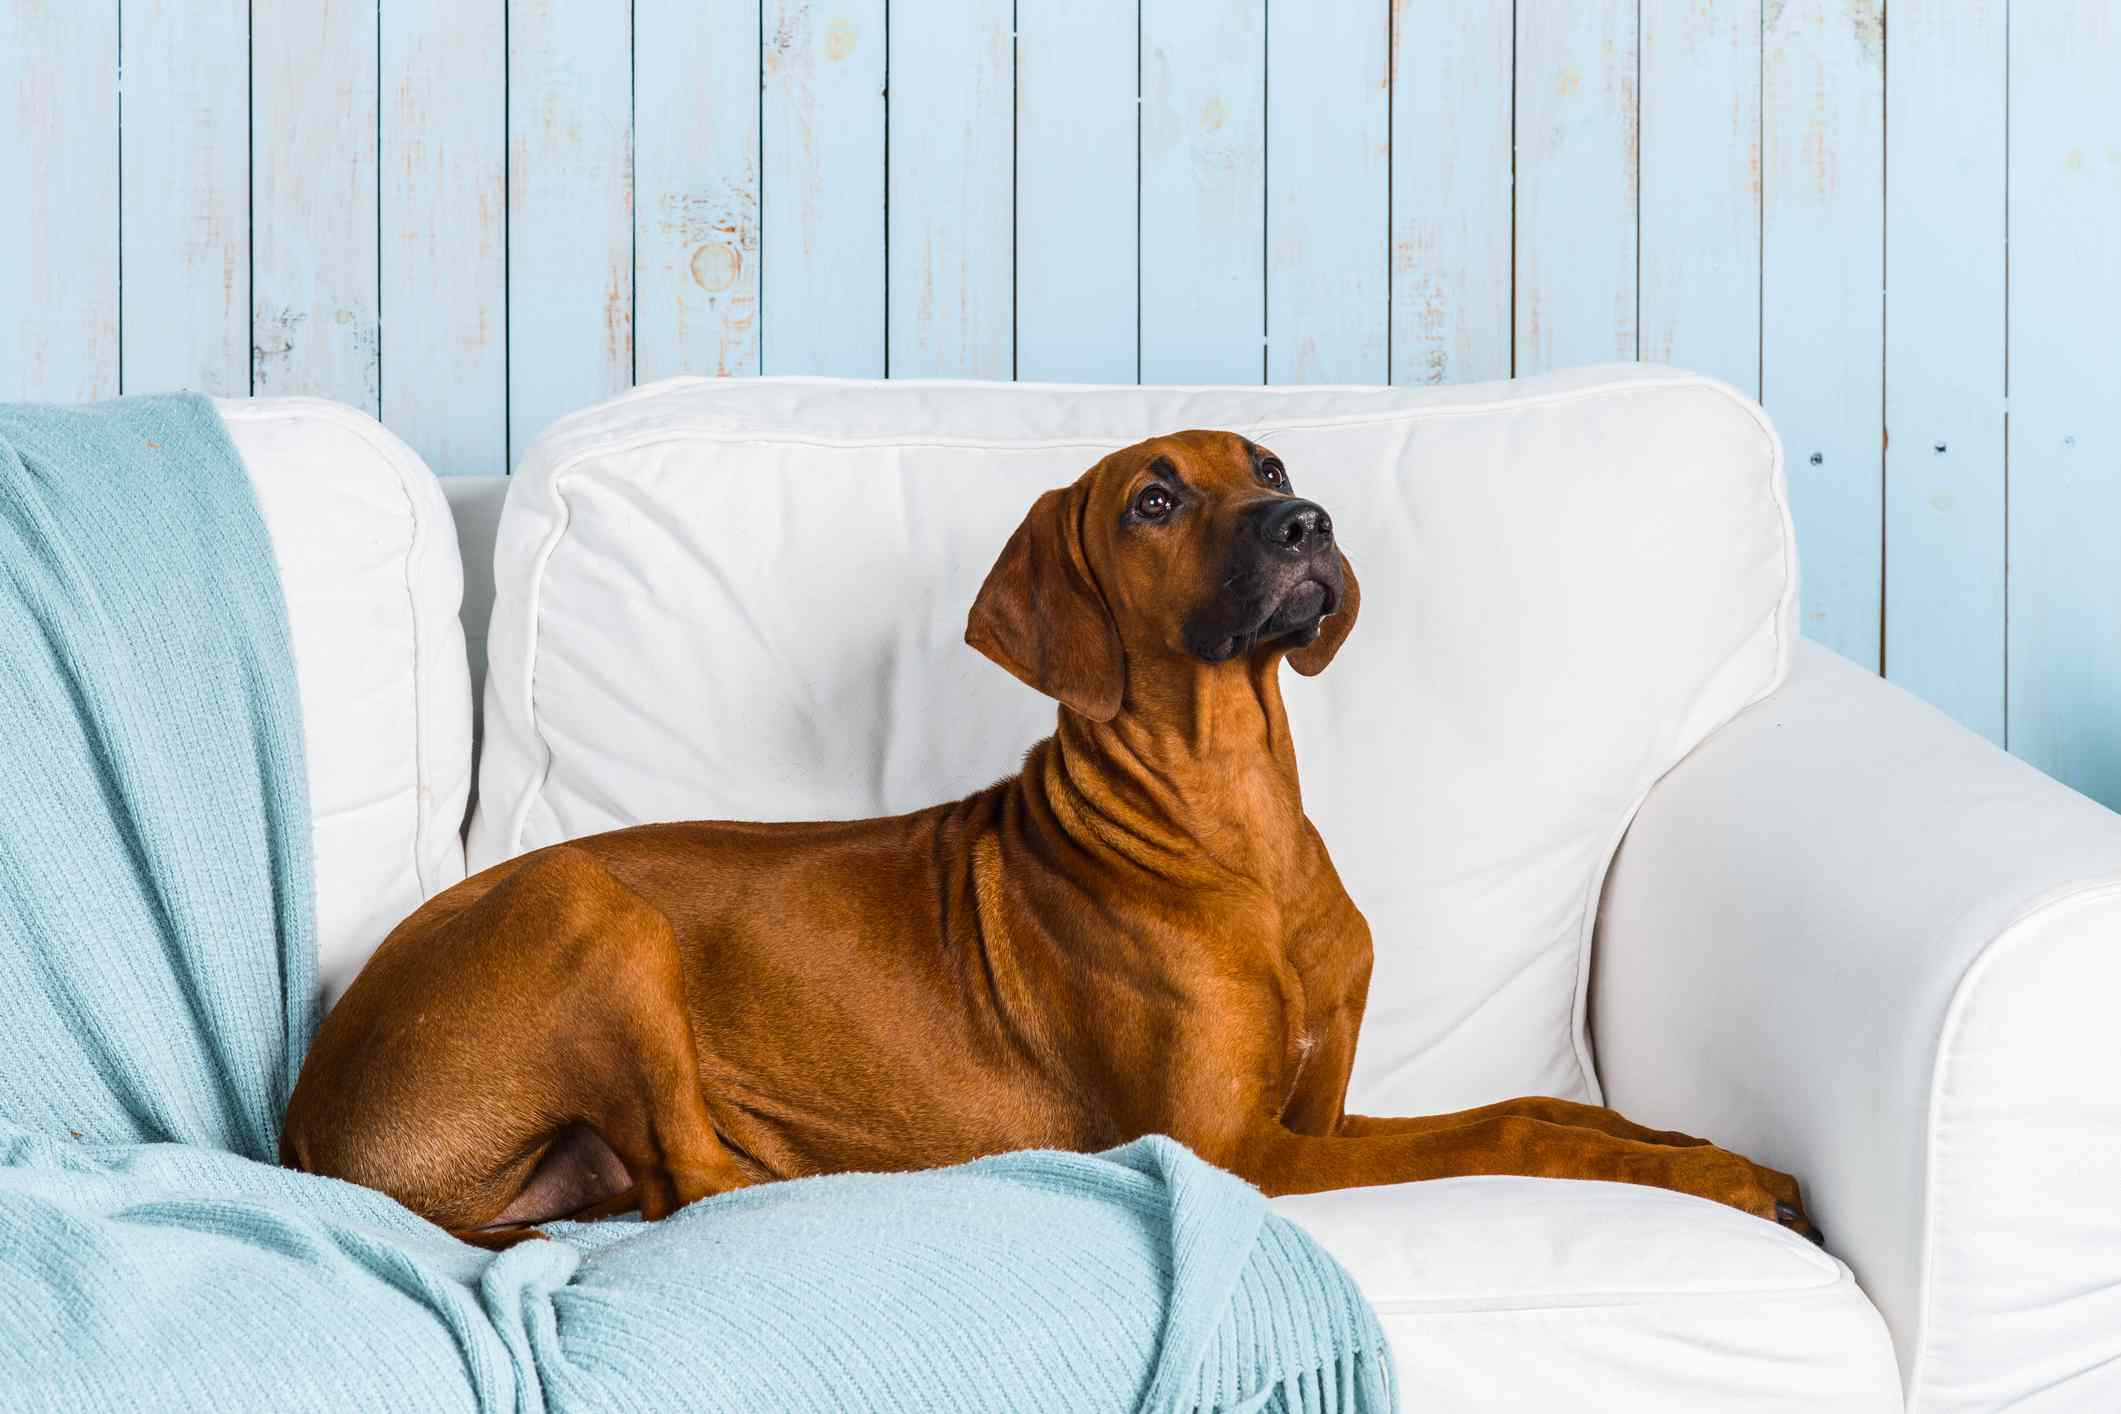 Rhodesian Ridgeback puppy on sofa